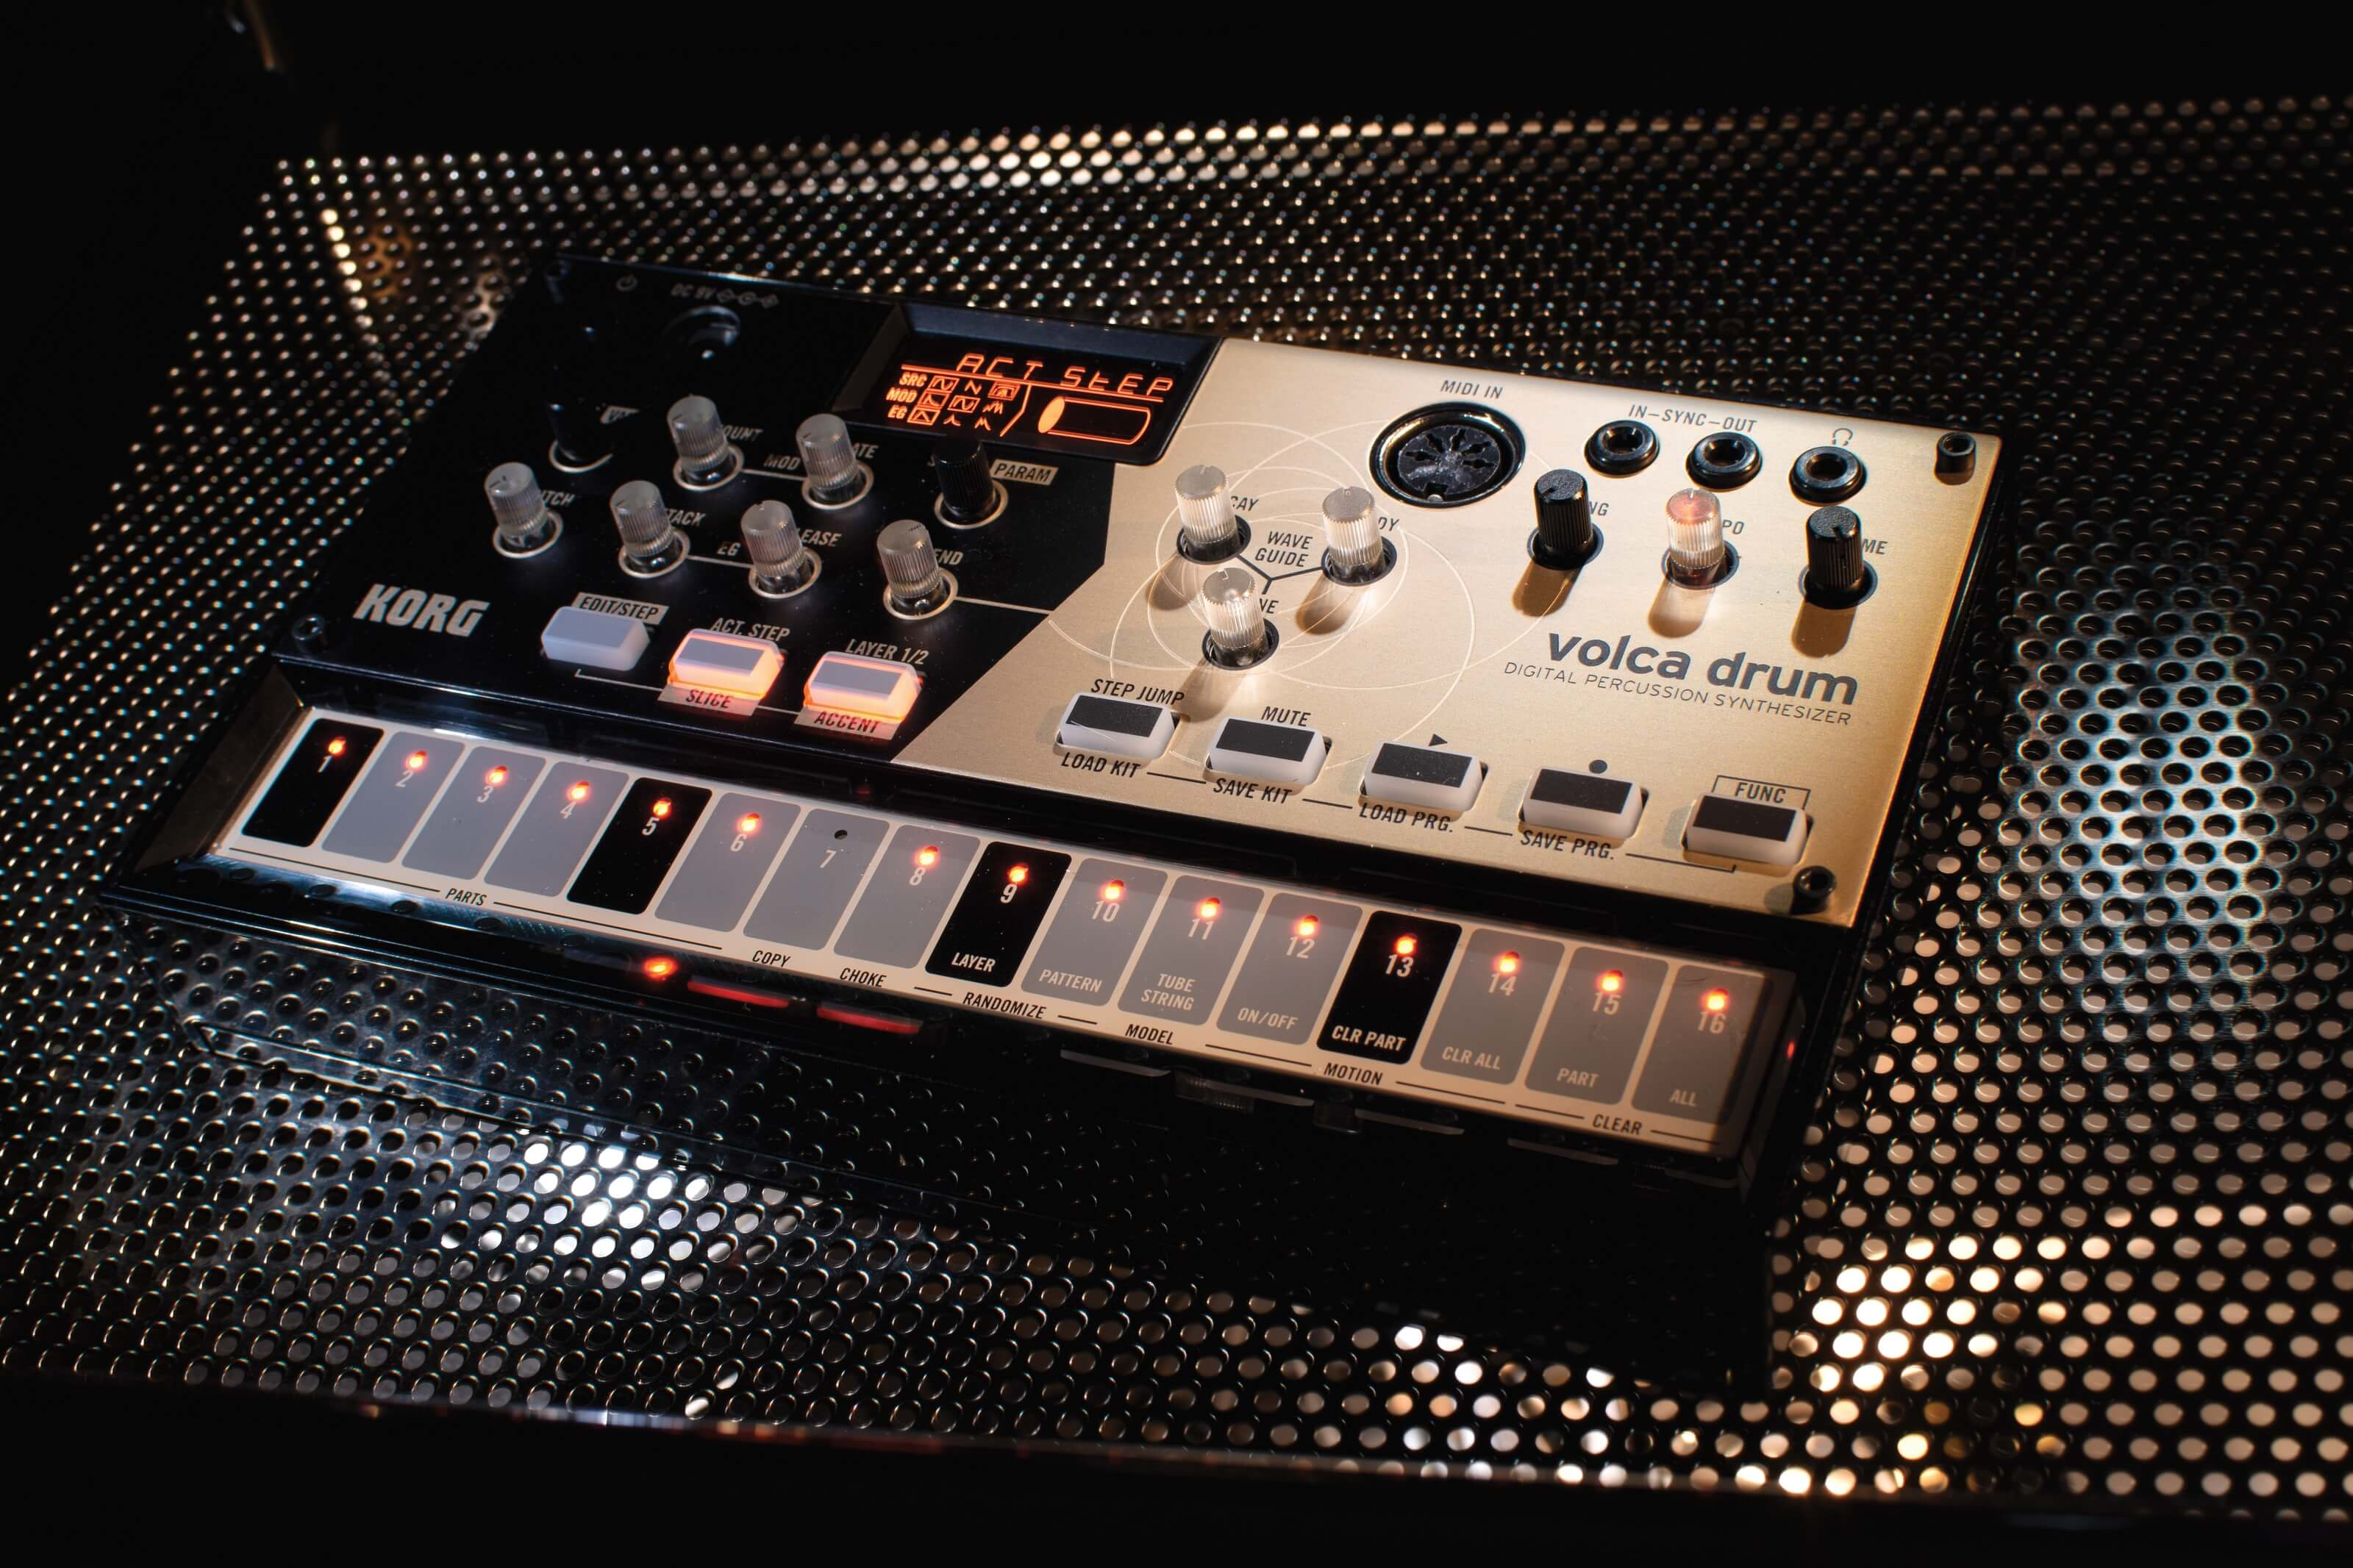 Korg Volca Drum & Modular, minilogue XD, KROME EX & KRONOS and KROSS